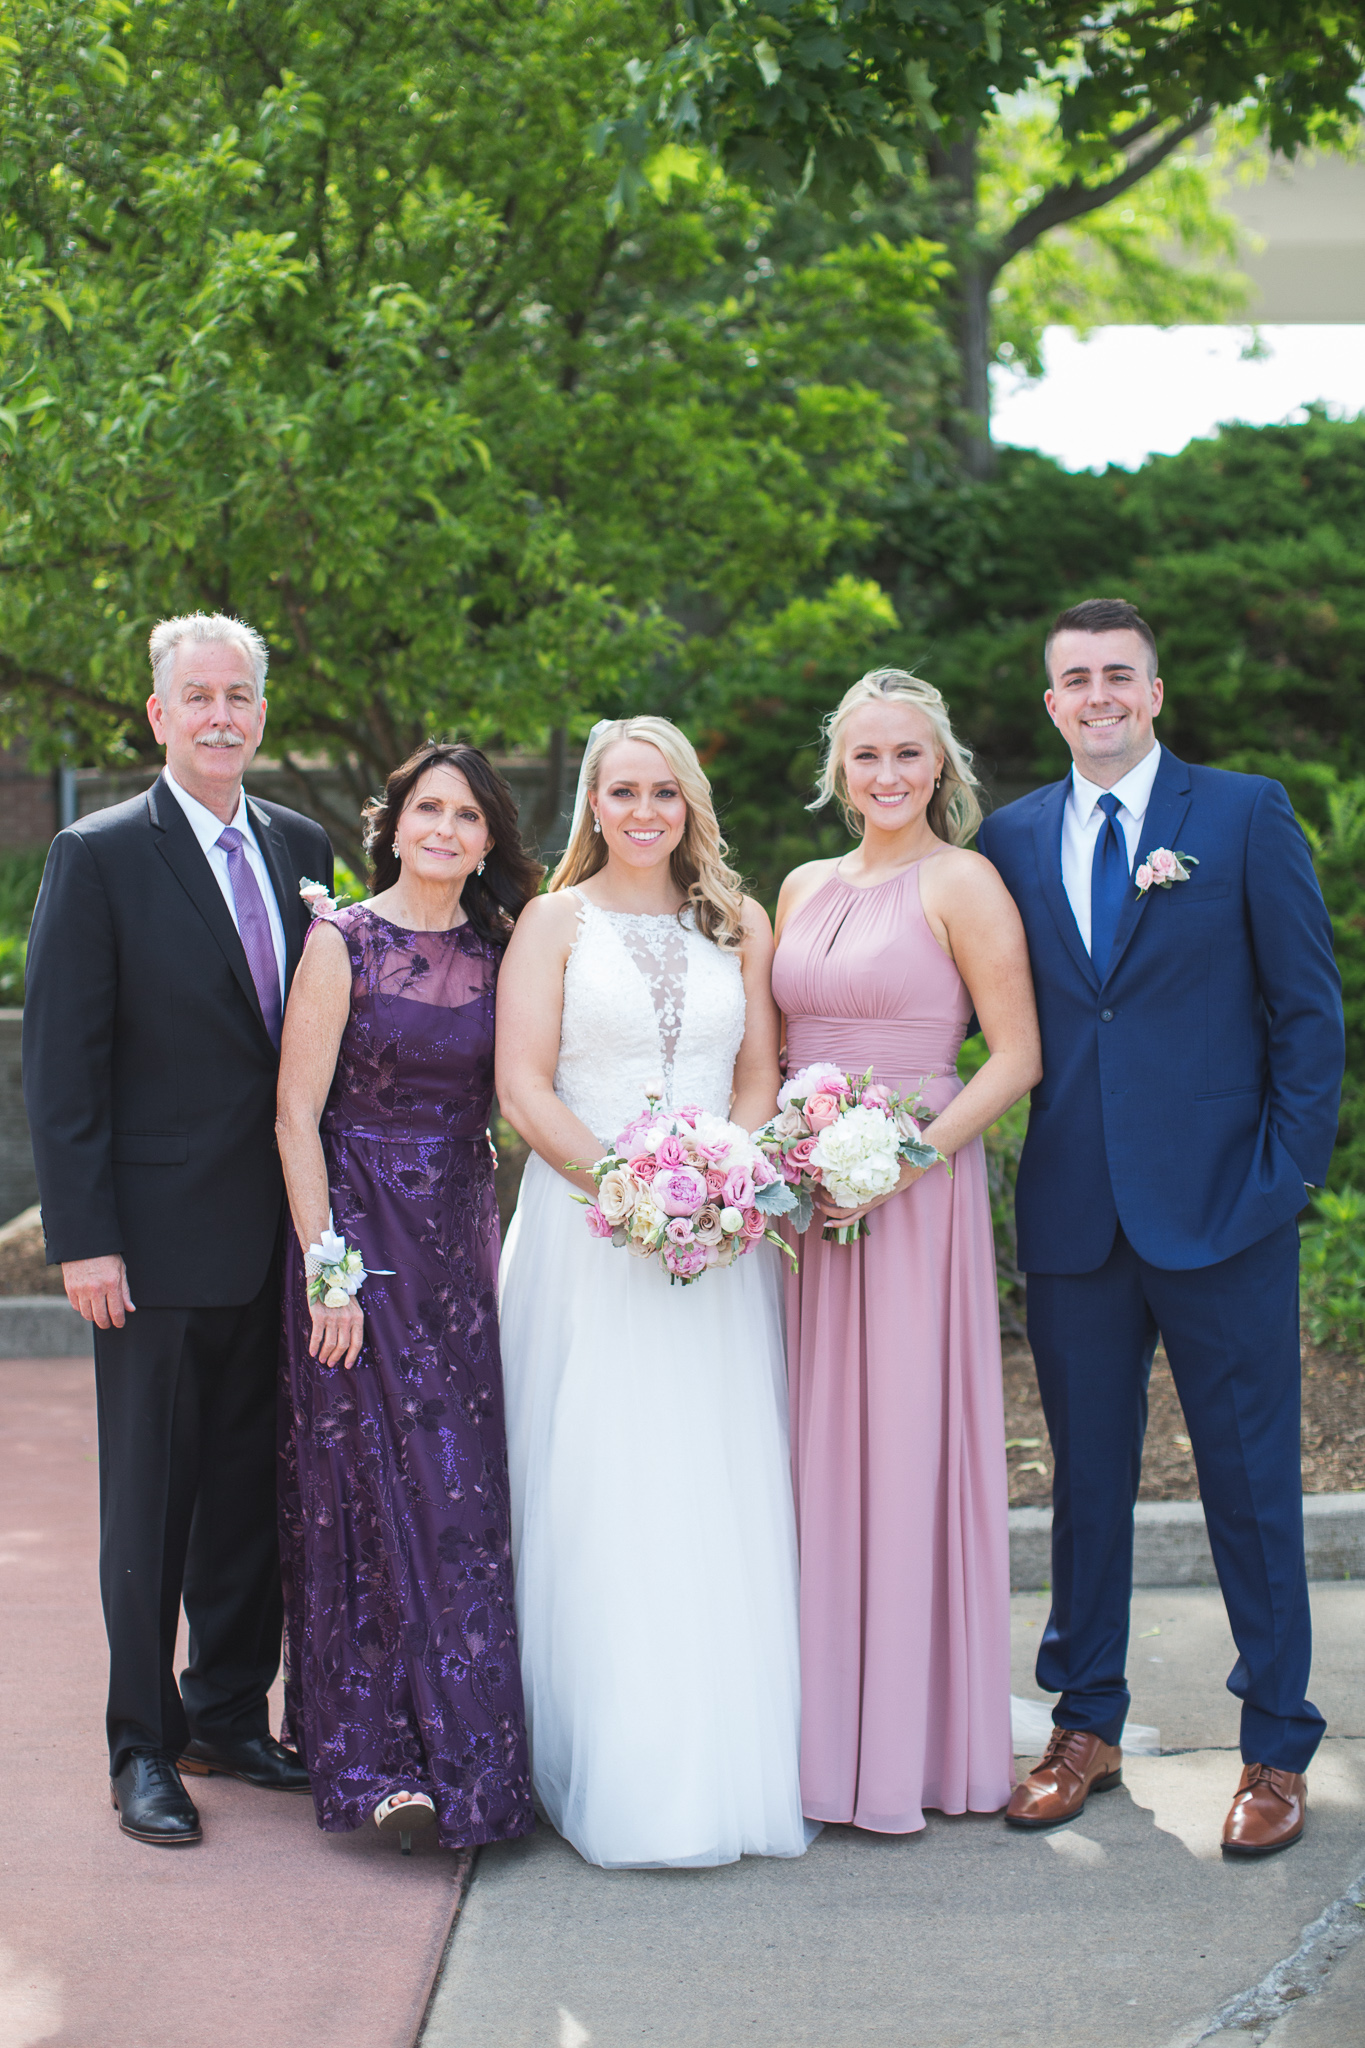 021-best-detroit-michigan-outdoor-wedding-photographer.jpg